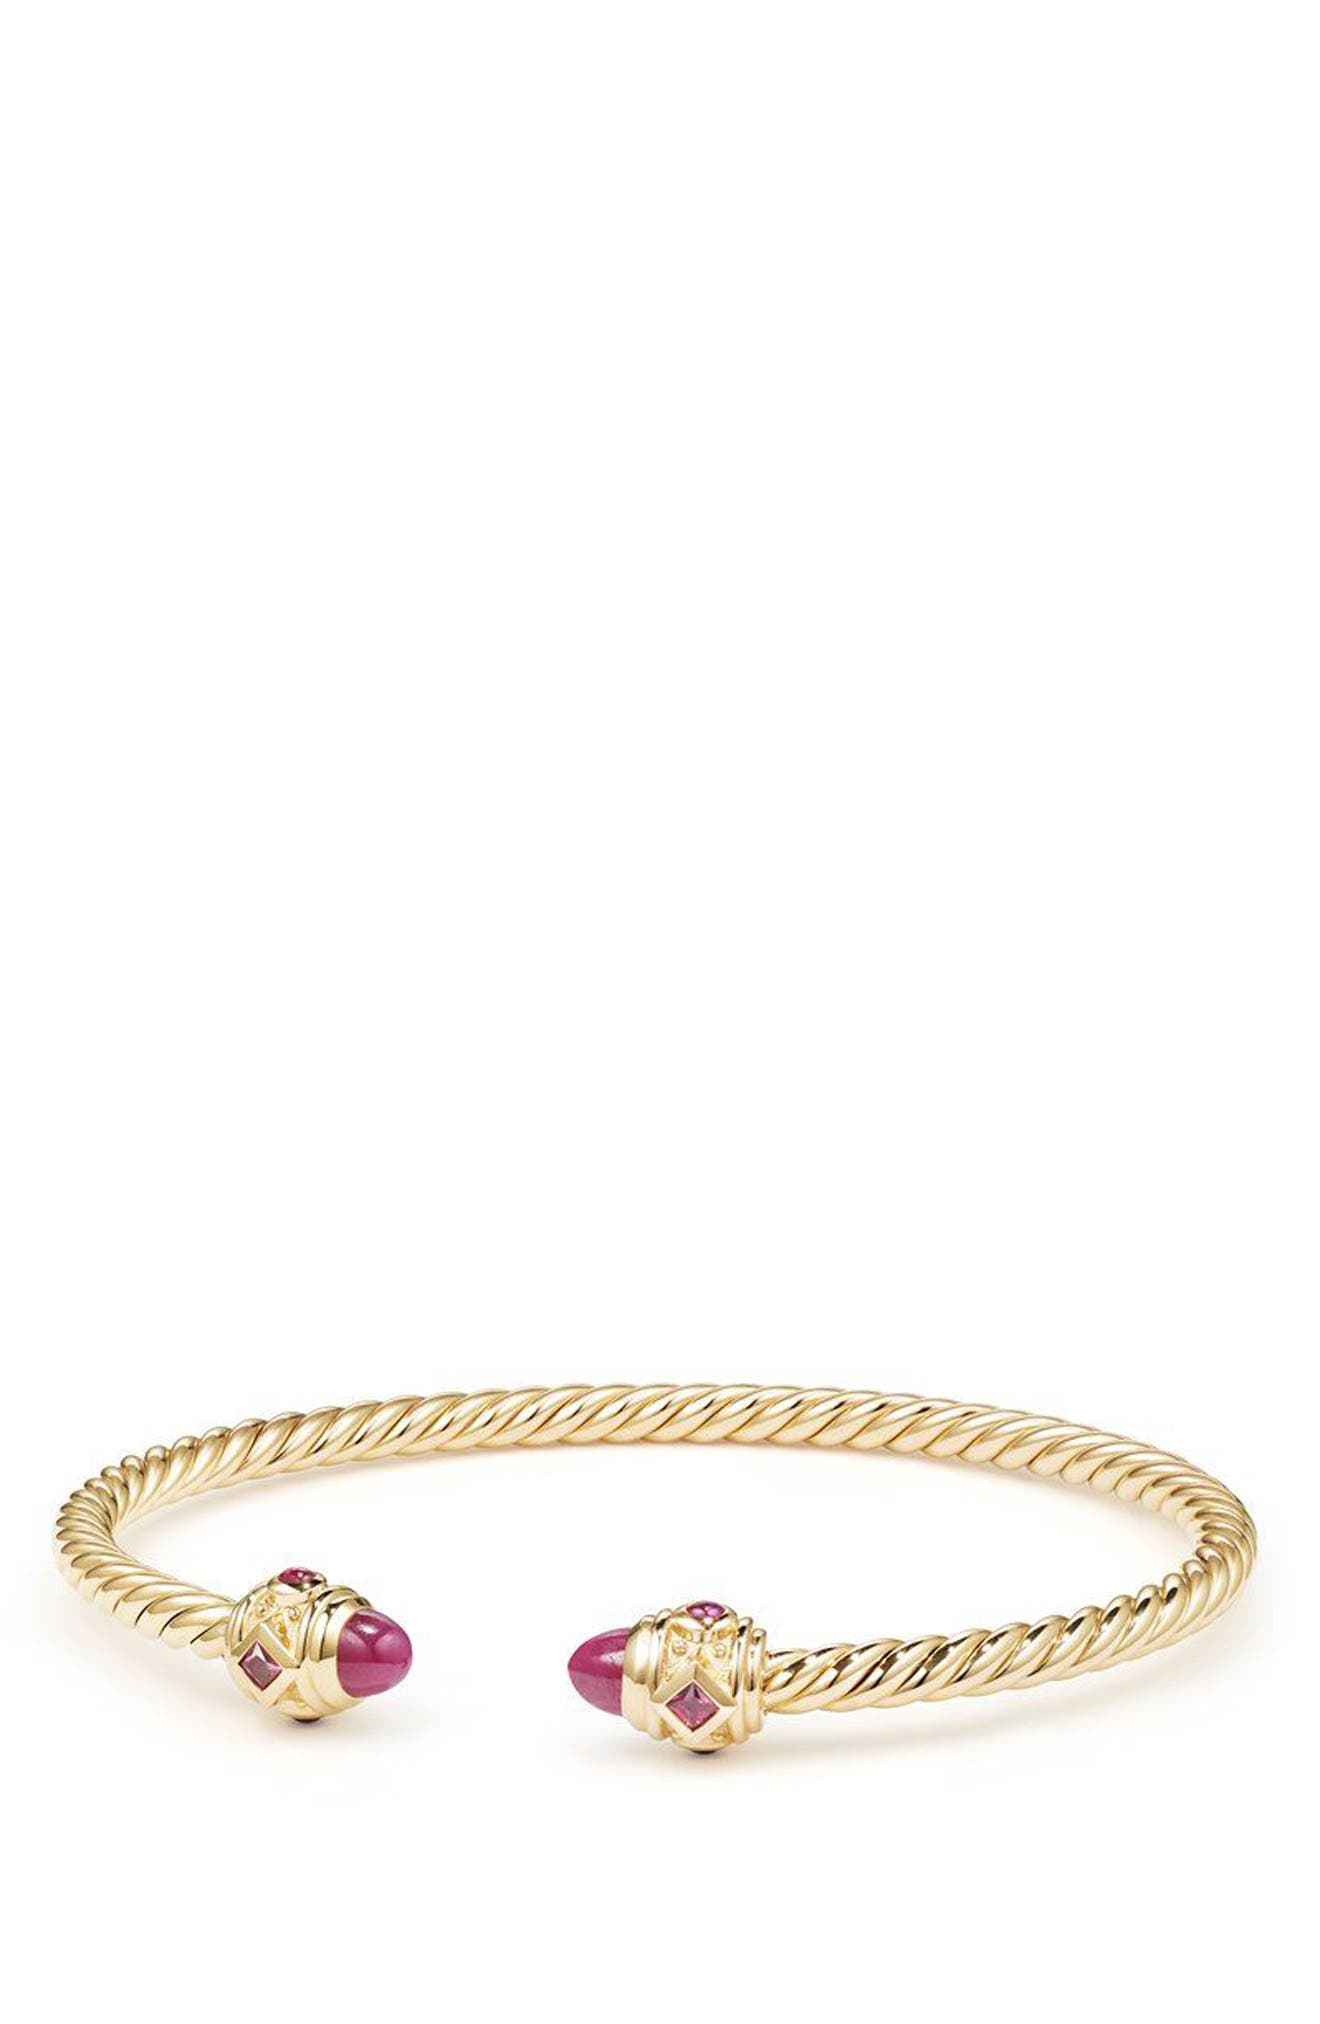 Renaissance Bracelet in 18K Gold, 3.5mm,                             Main thumbnail 1, color,                             Gold/ Ruby